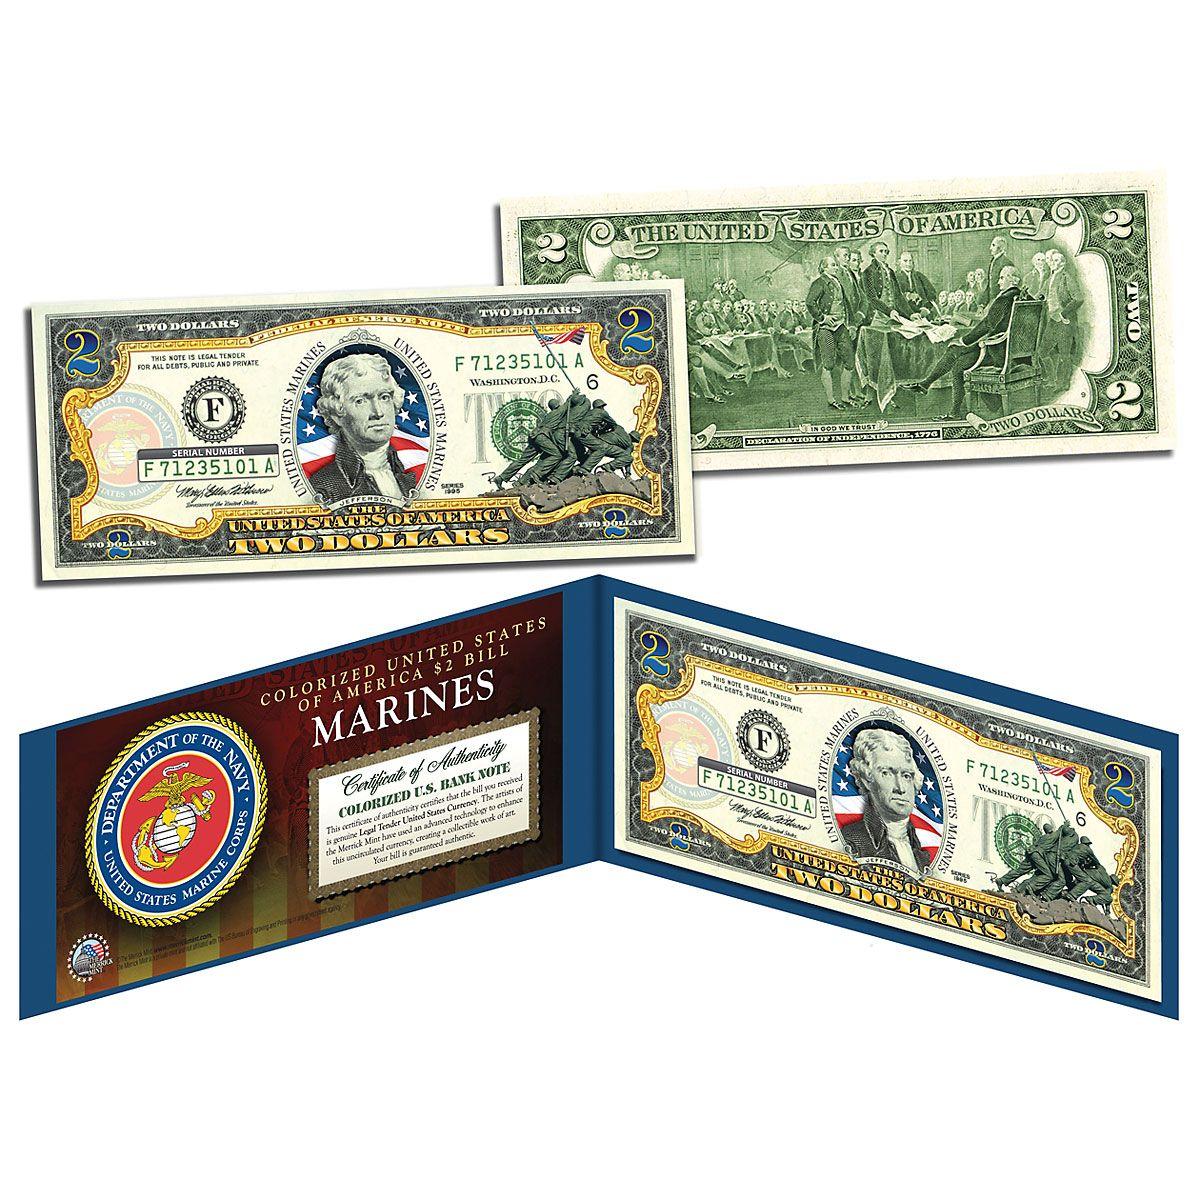 USA Marines WWII 2 Dollar Bill